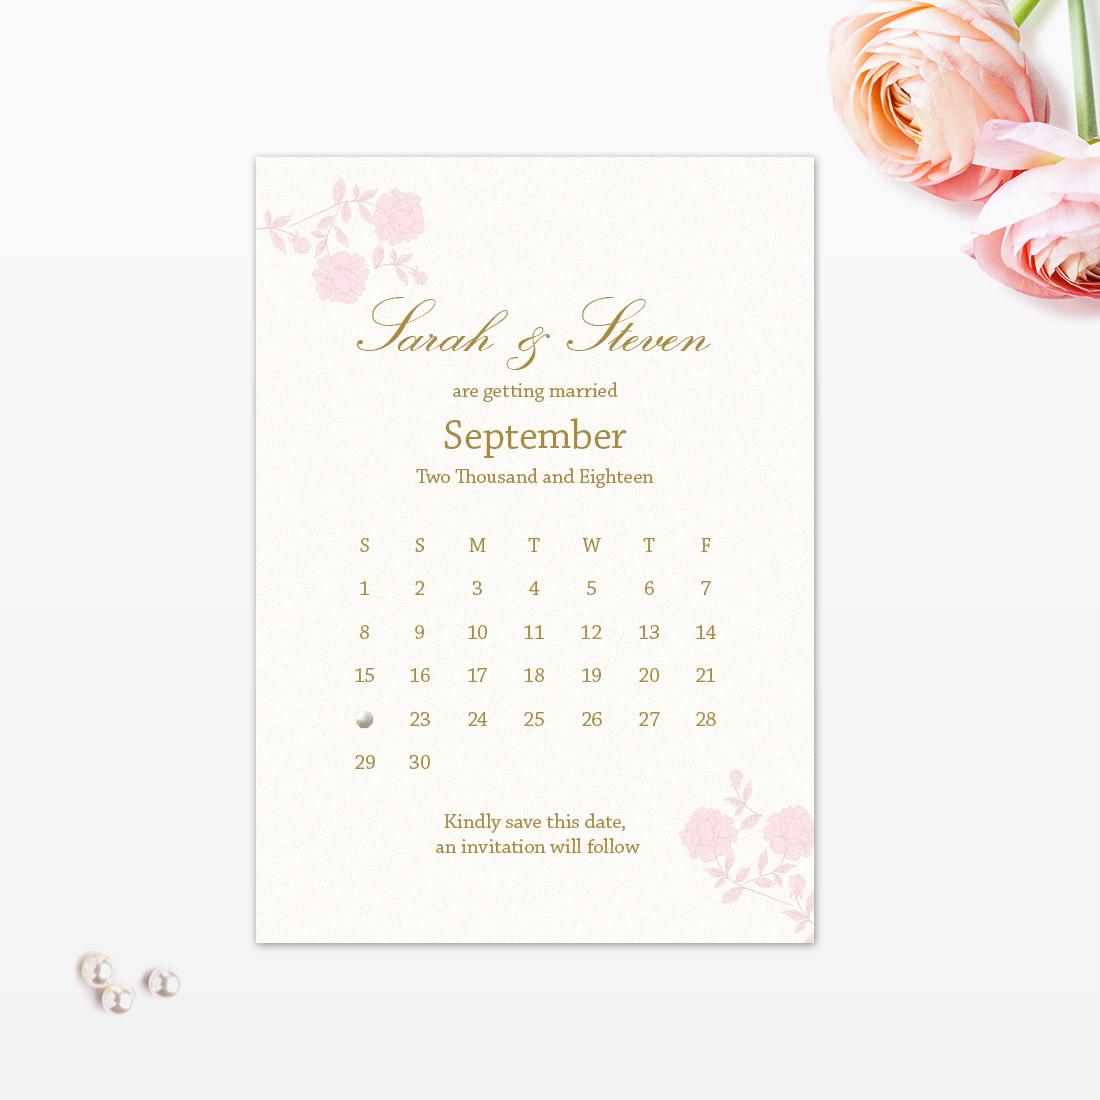 Vintage Rose Save the Date - Love Invited - Luxury Wedding ...